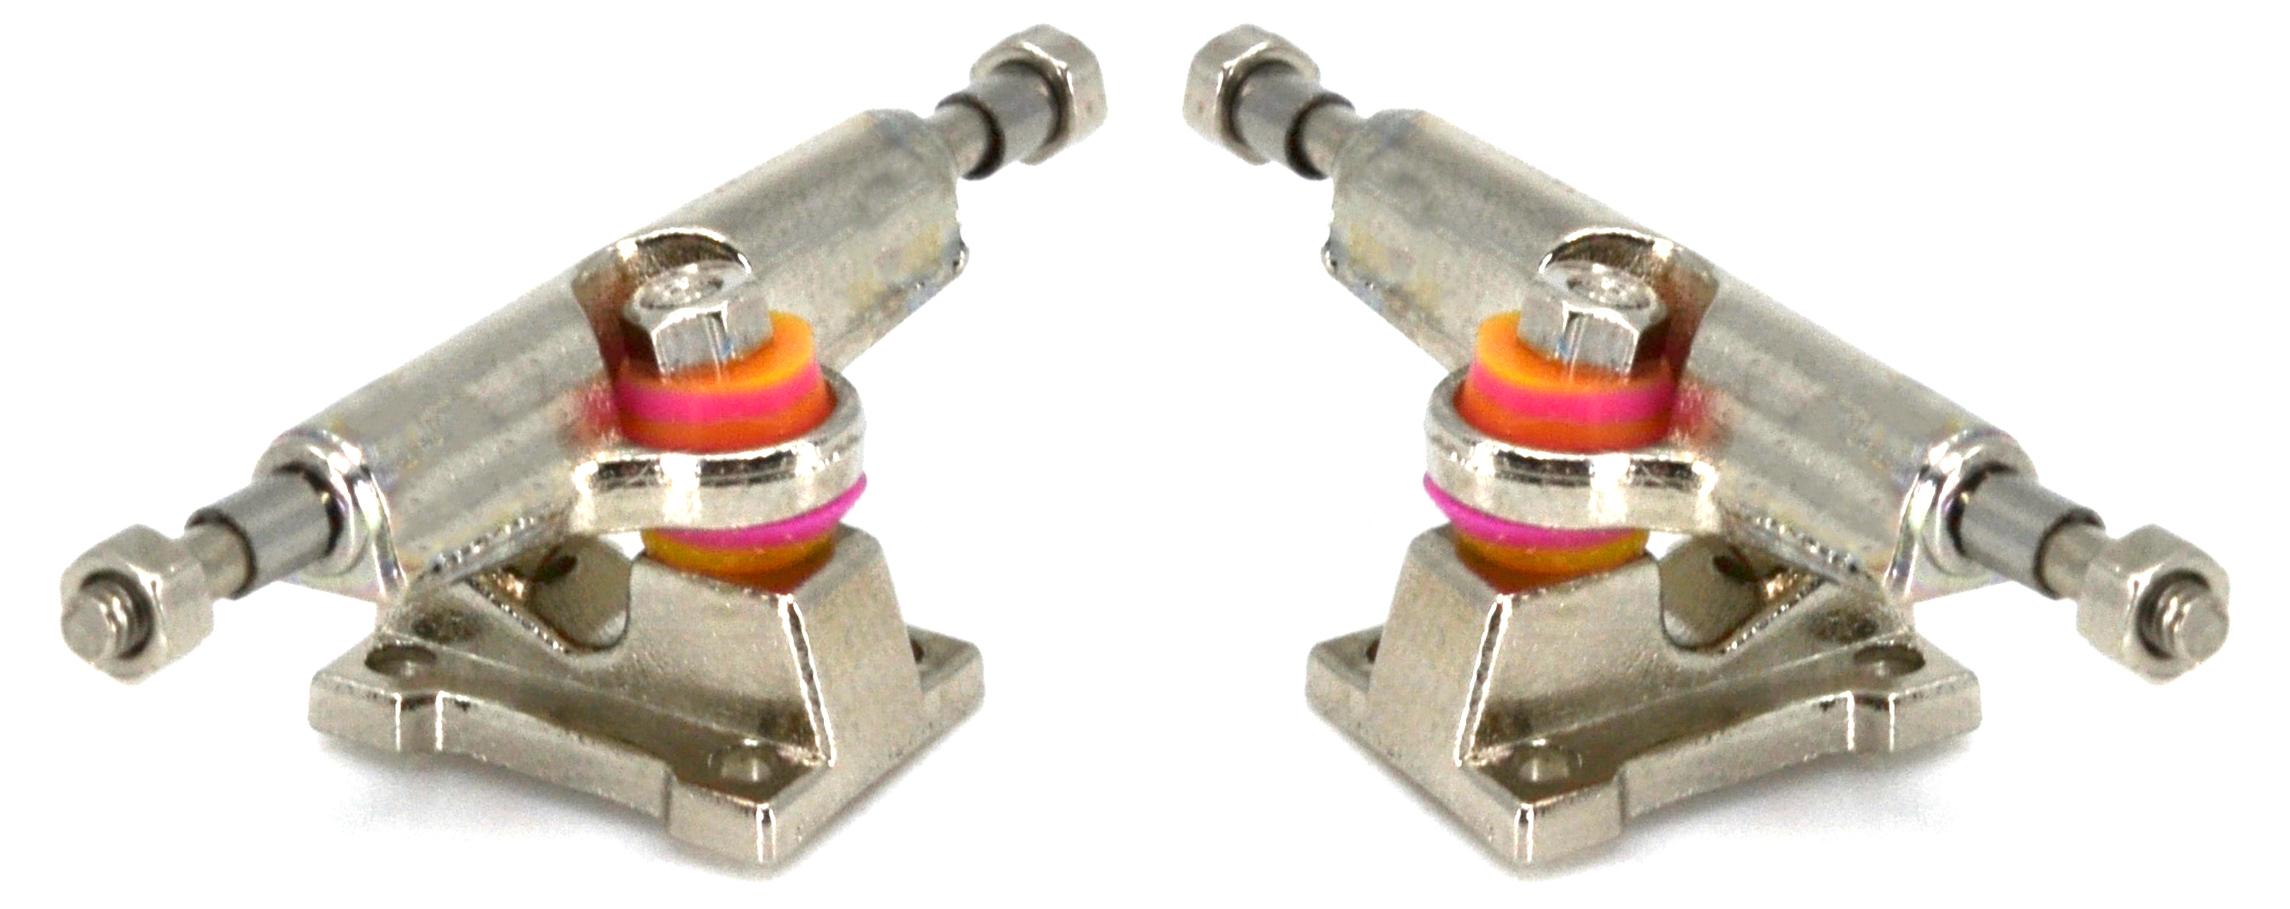 Bubble Bushings Professional Fingerboard Tuning Teak Tuning Pack of 5 Brown